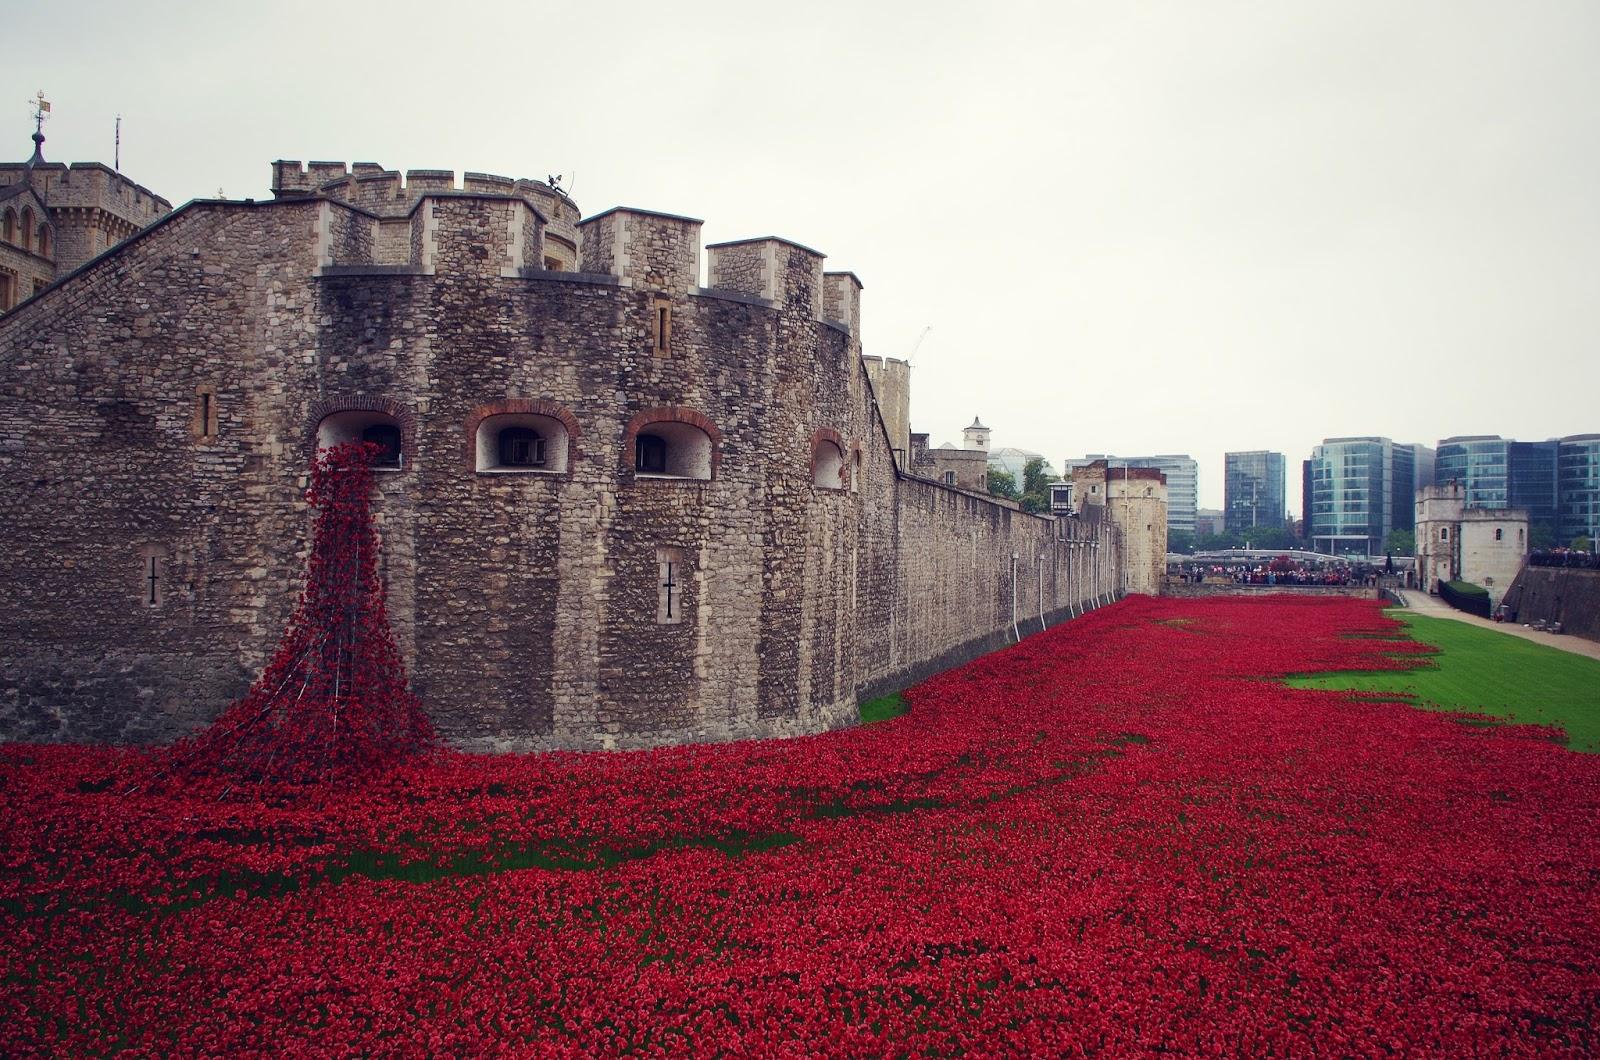 World War One Memorials in London During World War One